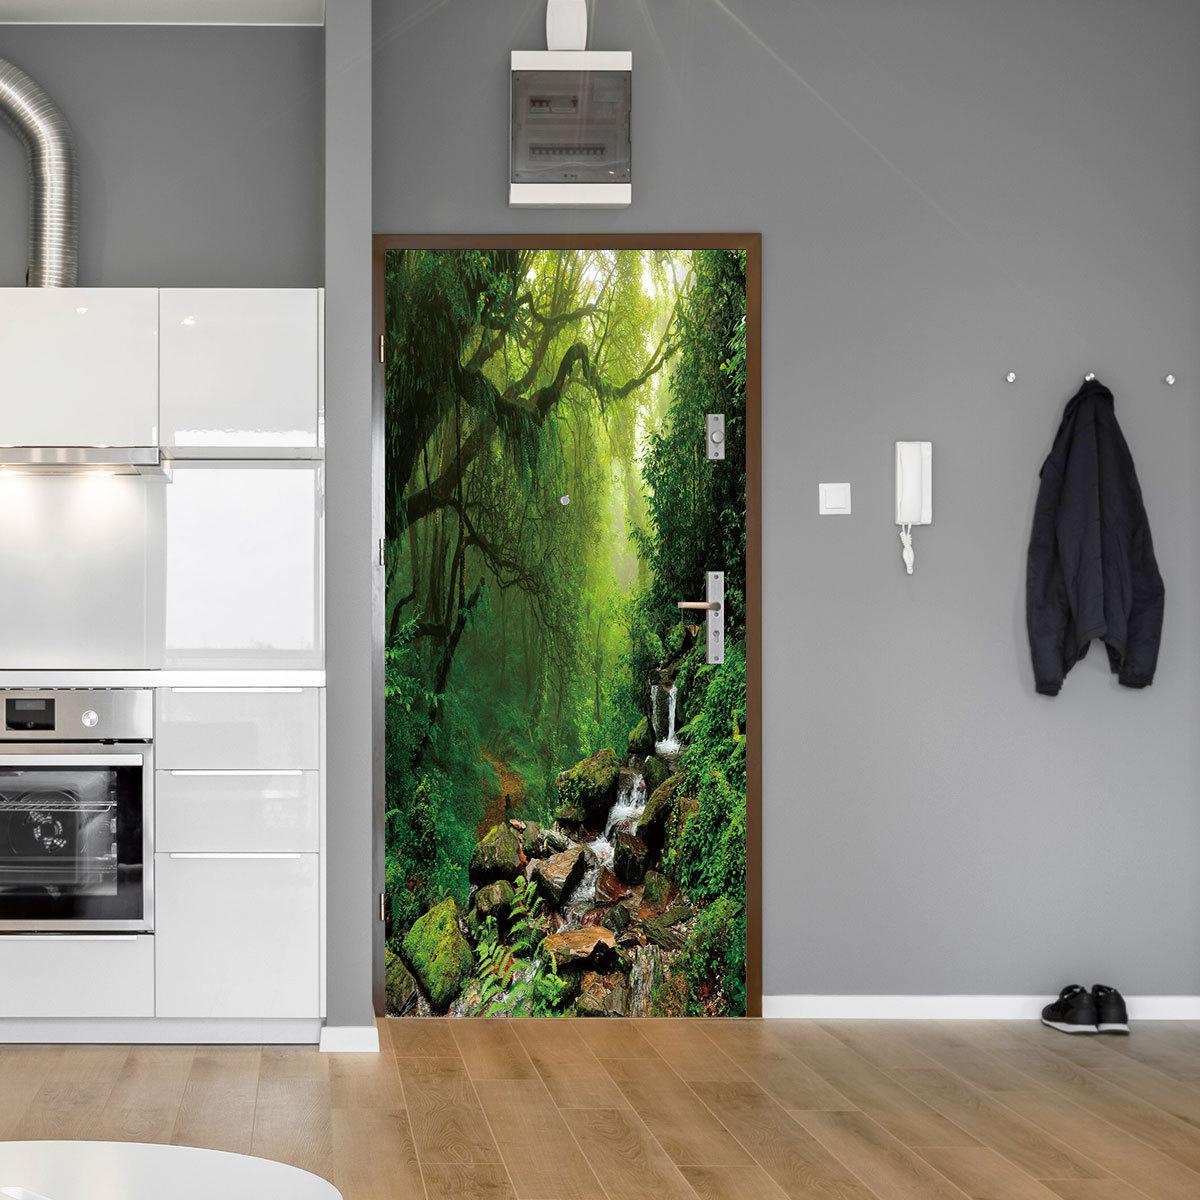 DZMT071丛林迷雾创意3d立体门贴 家居个性装饰墙贴自粘背胶防水